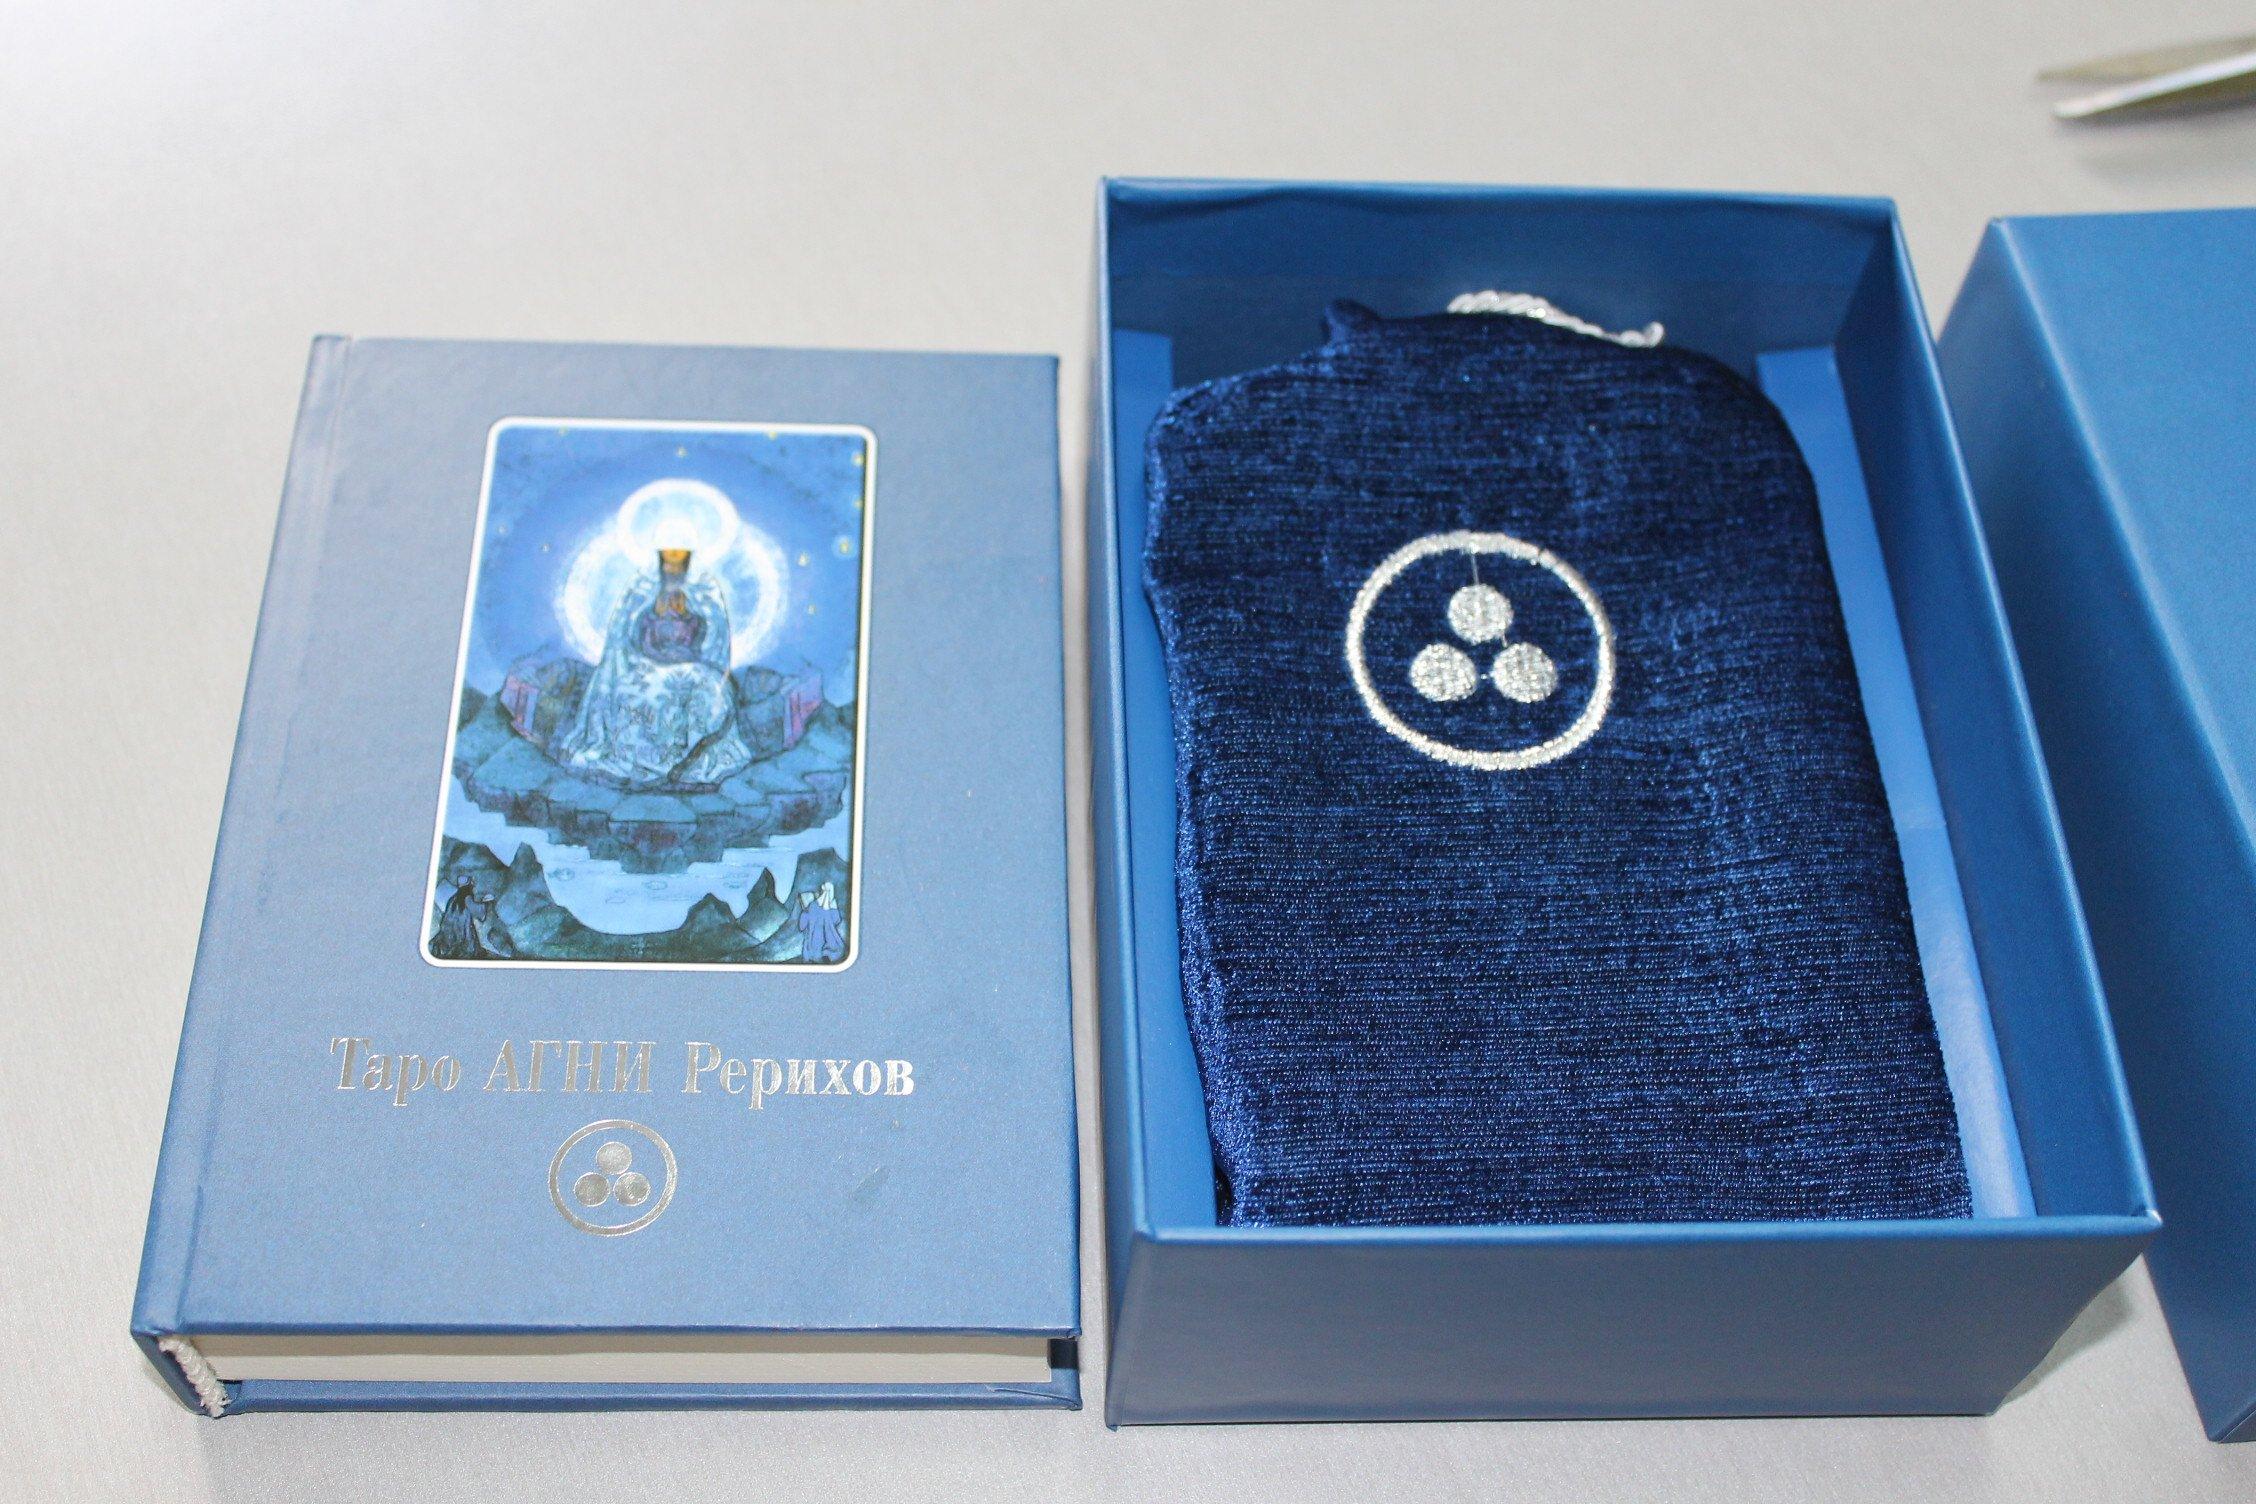 Big Tarot Agni Roerich Card Deck + Russian Book ТАРО АГНИ РЕРИХОВ HANUKKAH SALE